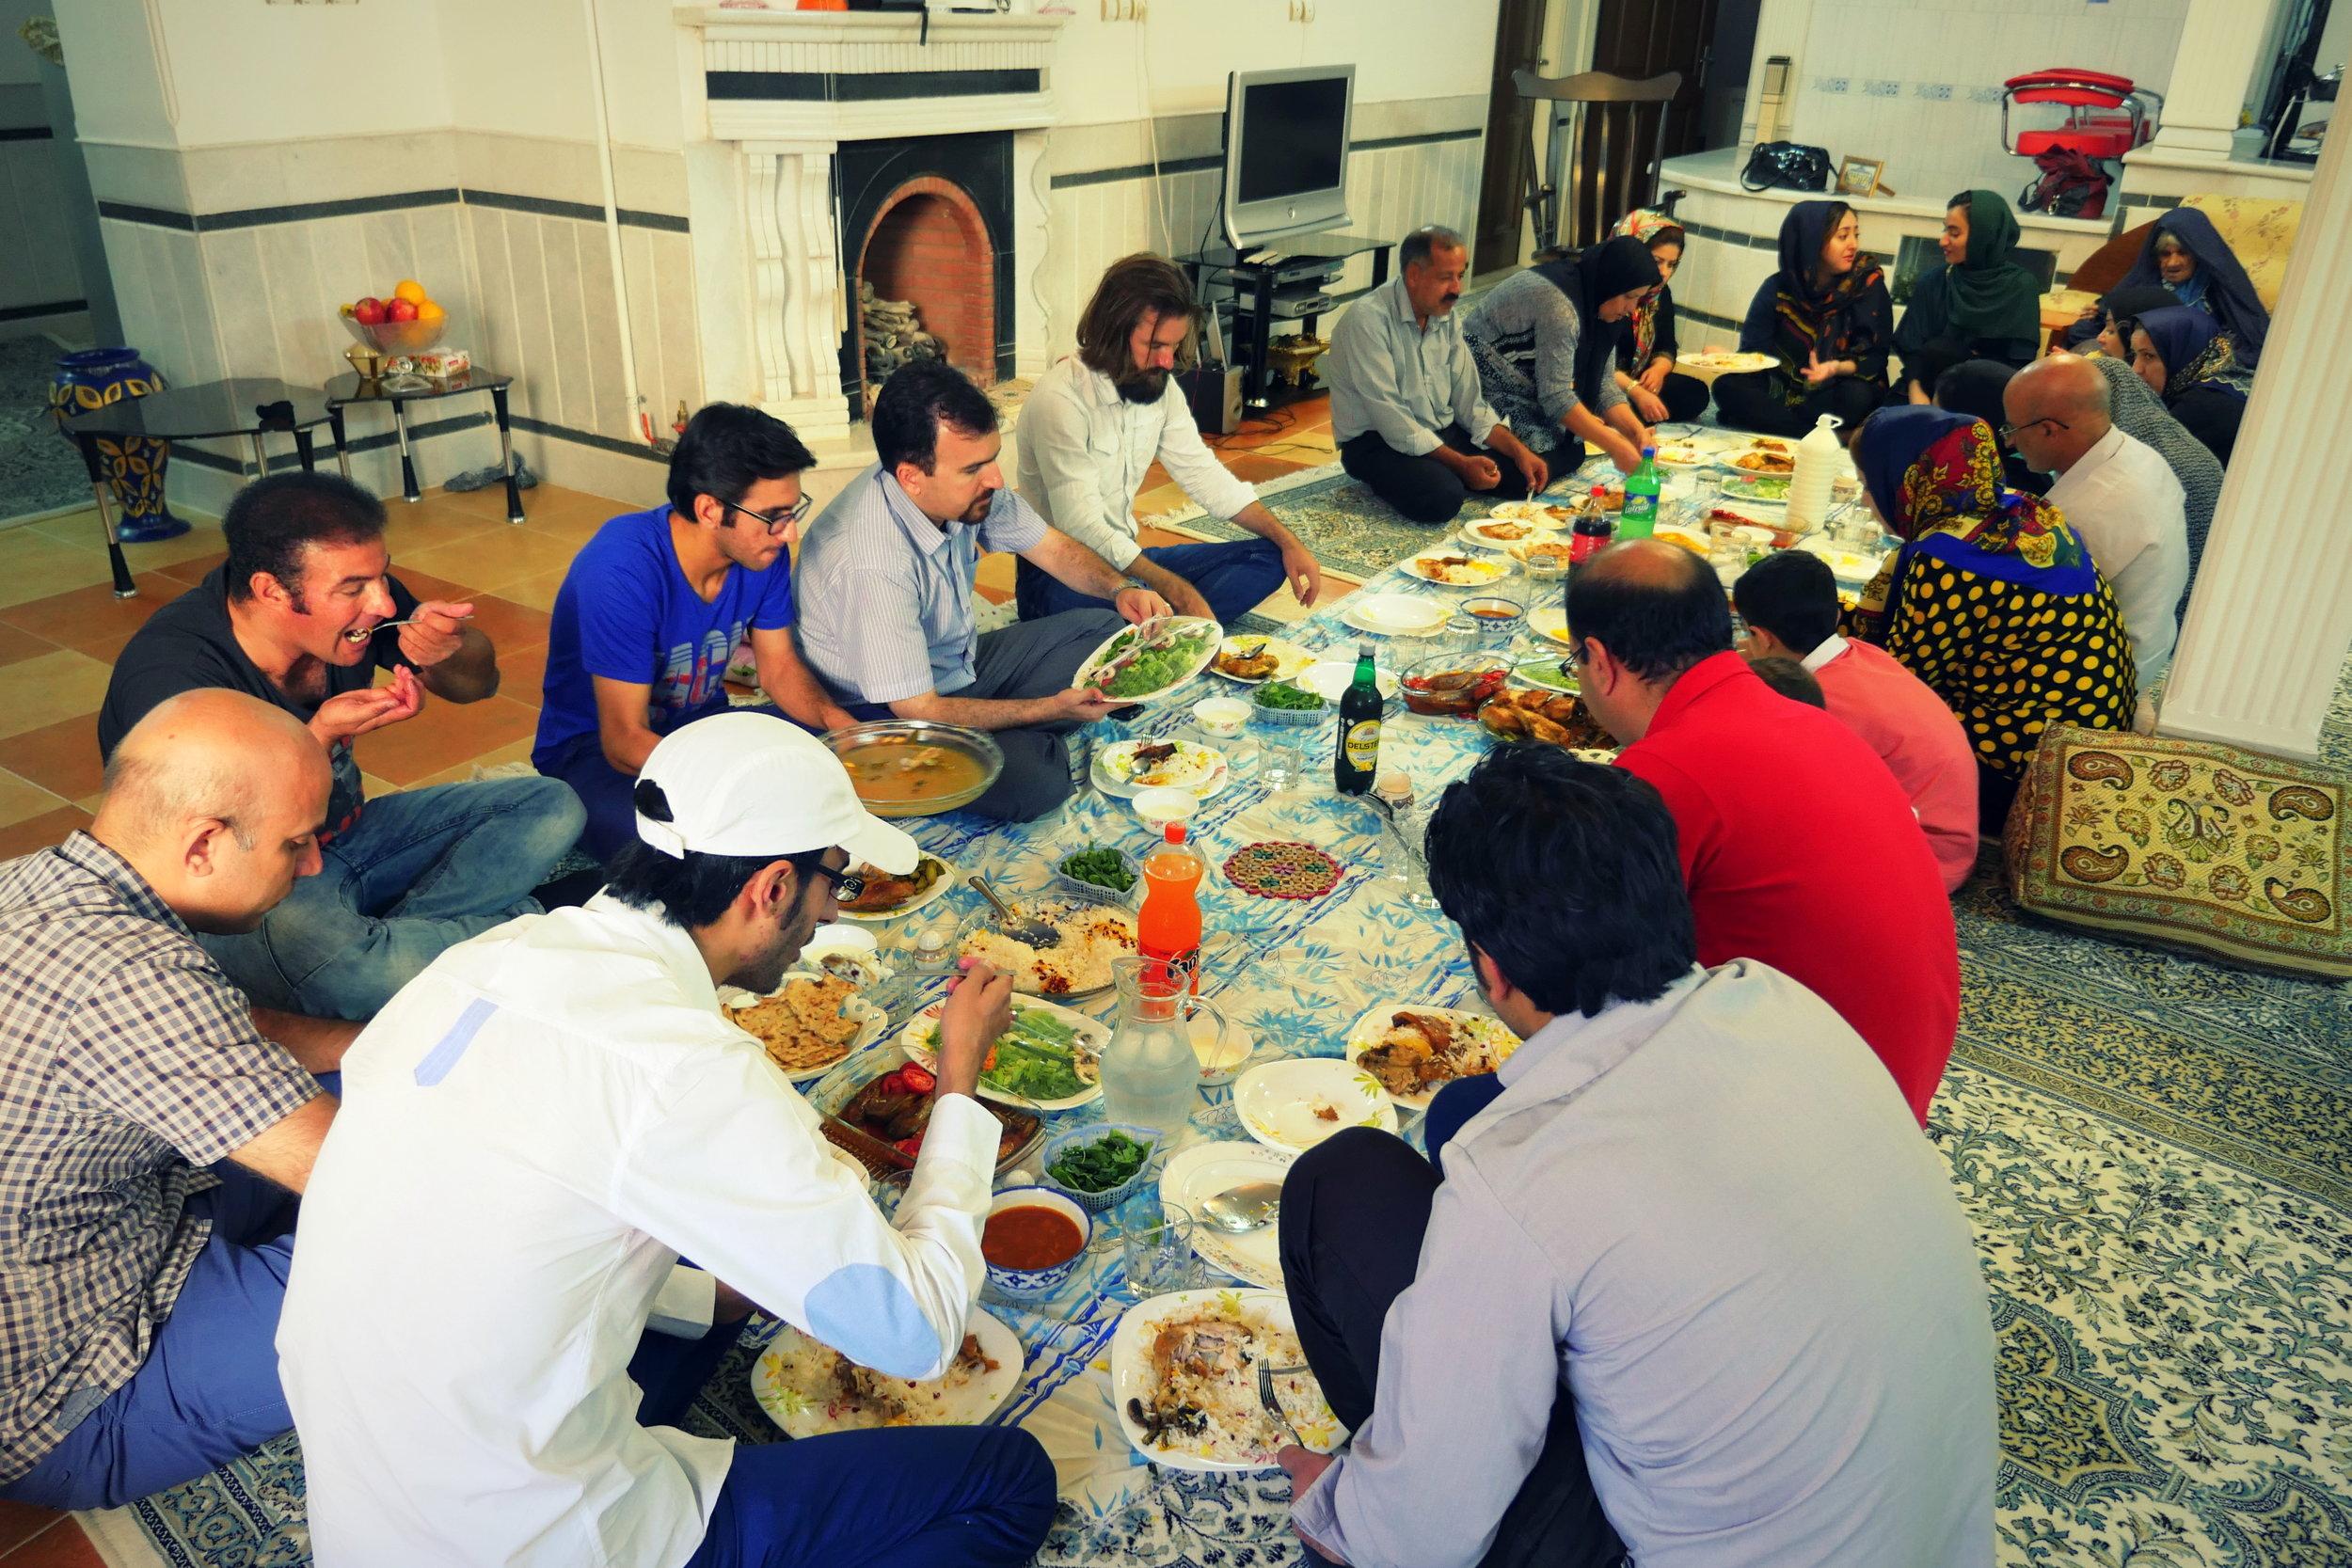 23. Iran, Yaz, celebrating with the family of Sima.jpg